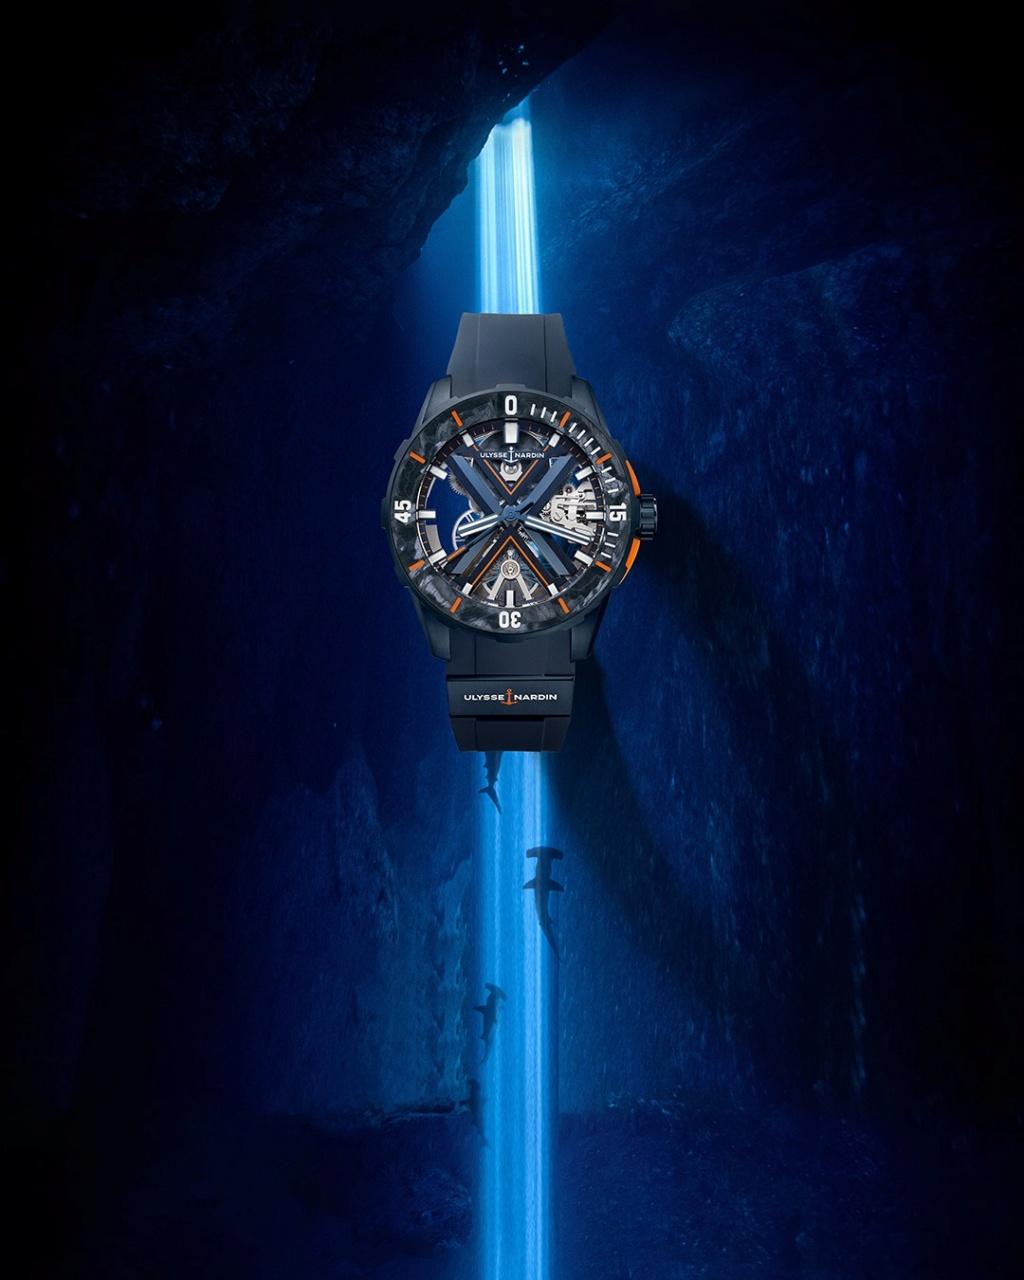 Nouveauté 2021 Ulysse Nardin - Diver X Skeleton 17029510